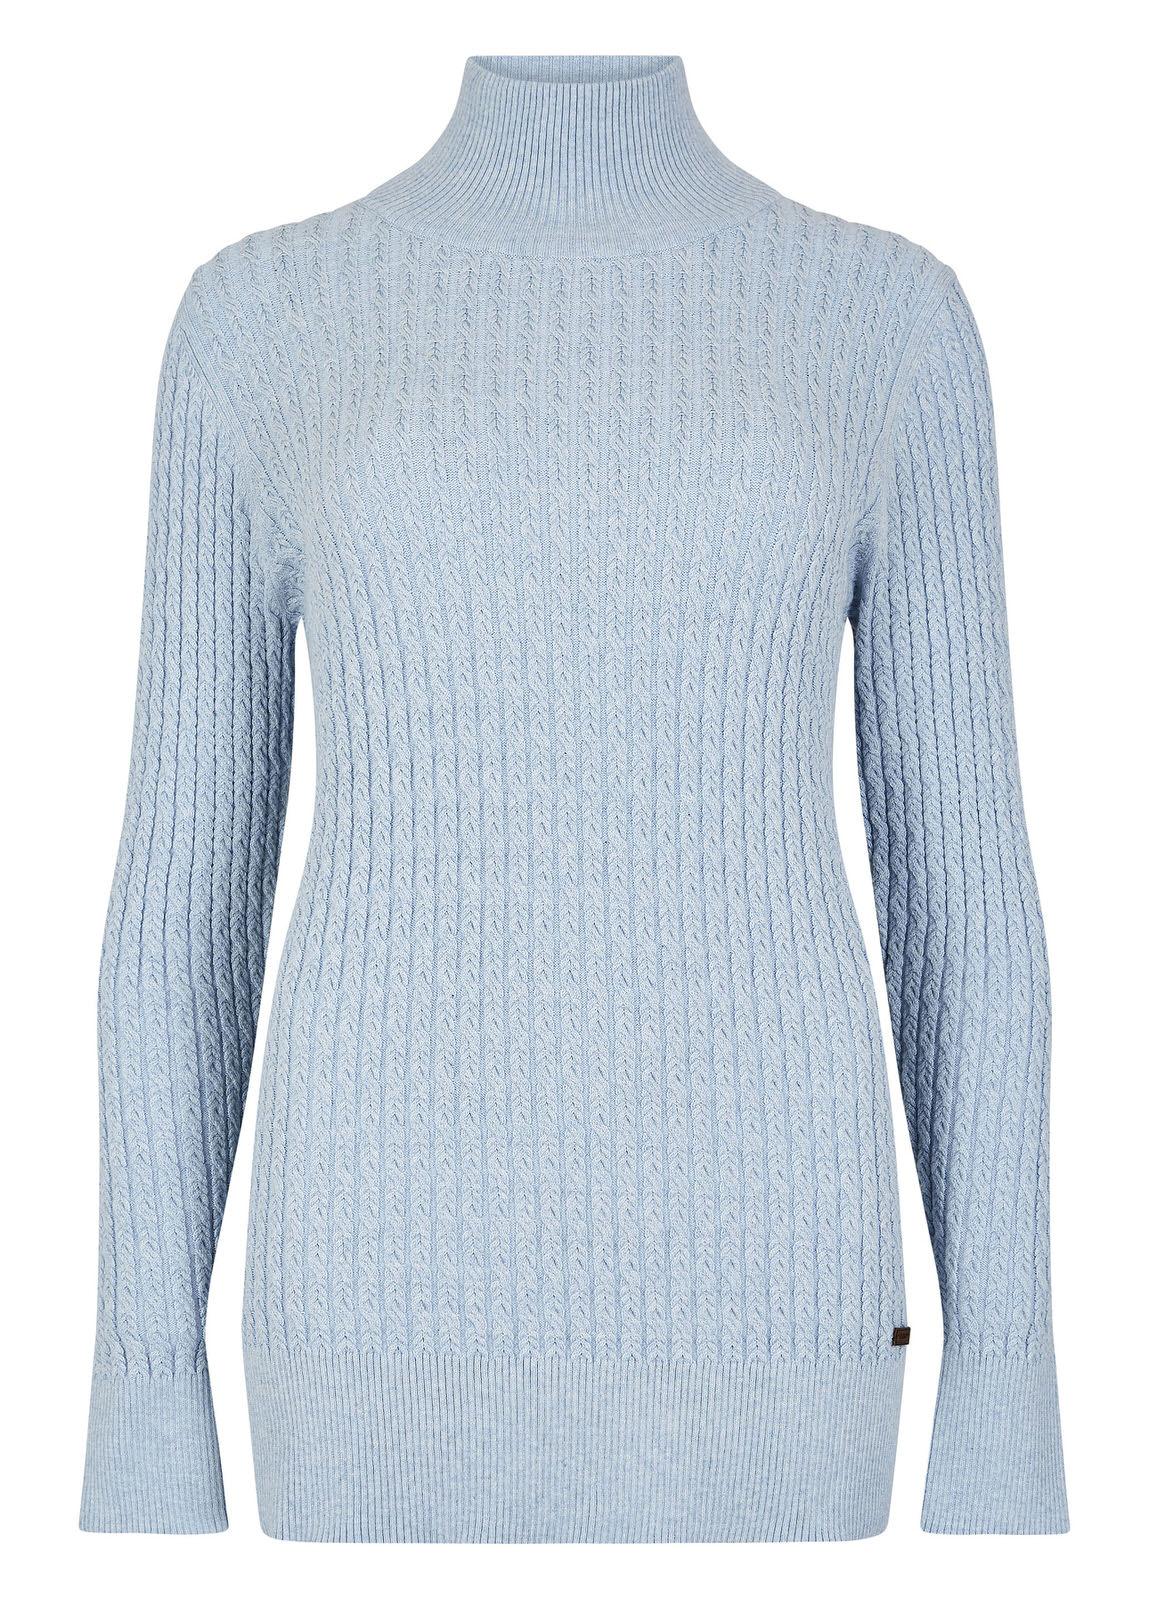 Cormack_Women's_sweater_Pale_Blue_Image_1